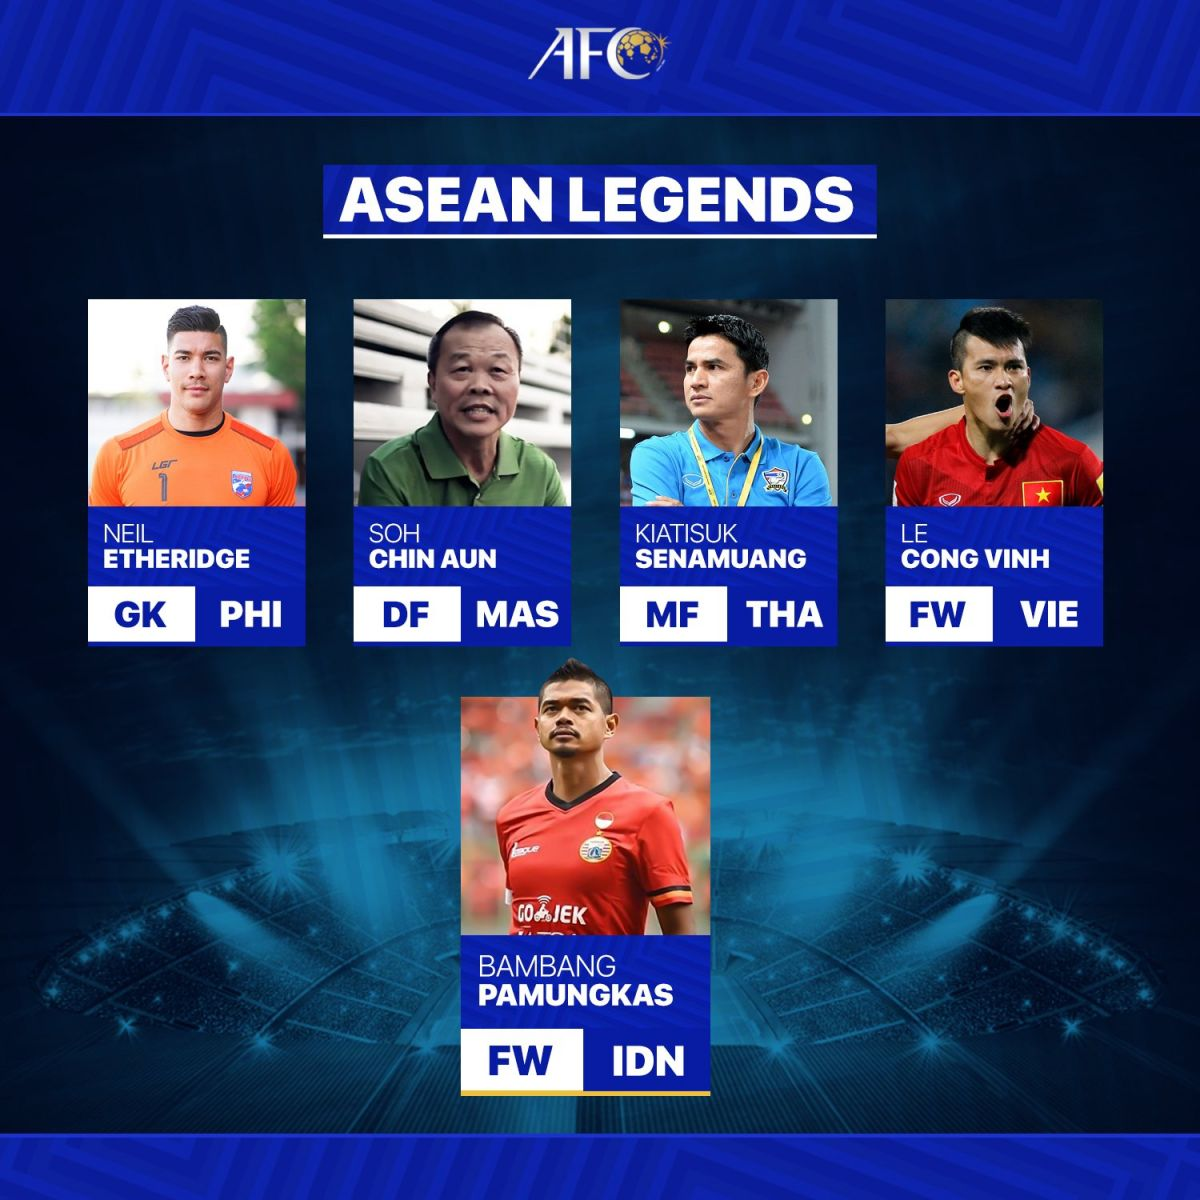 5 legenda Asia Tenggara versis AFC. (Foto: AFC).